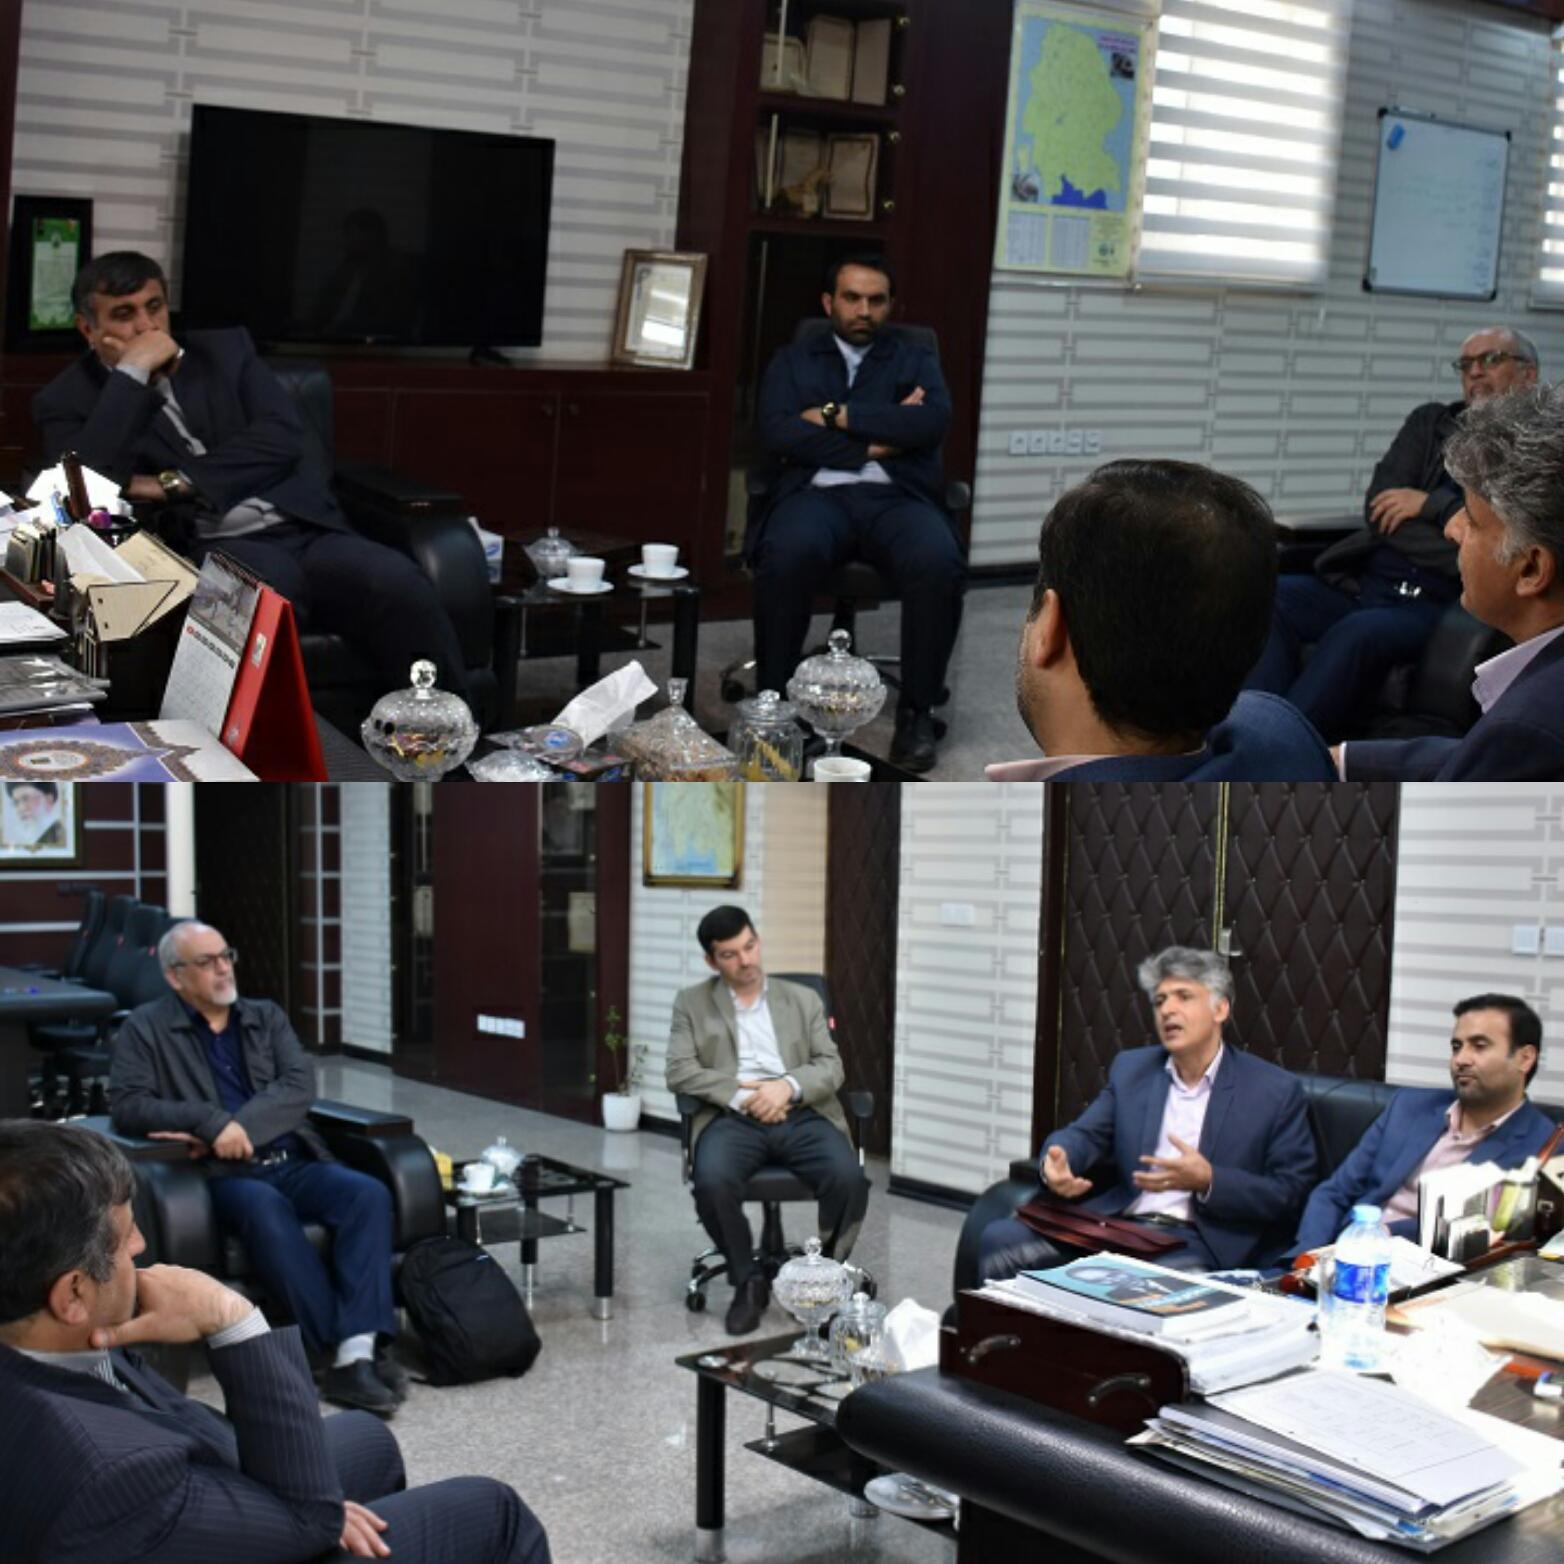 IMG ۲۰۱۹۰۲۱۸ ۲۱۵۸۰۲ لزوم تقویت هواشناسی خوزستان از لحاظ سخت افزاری و نرم افزاری